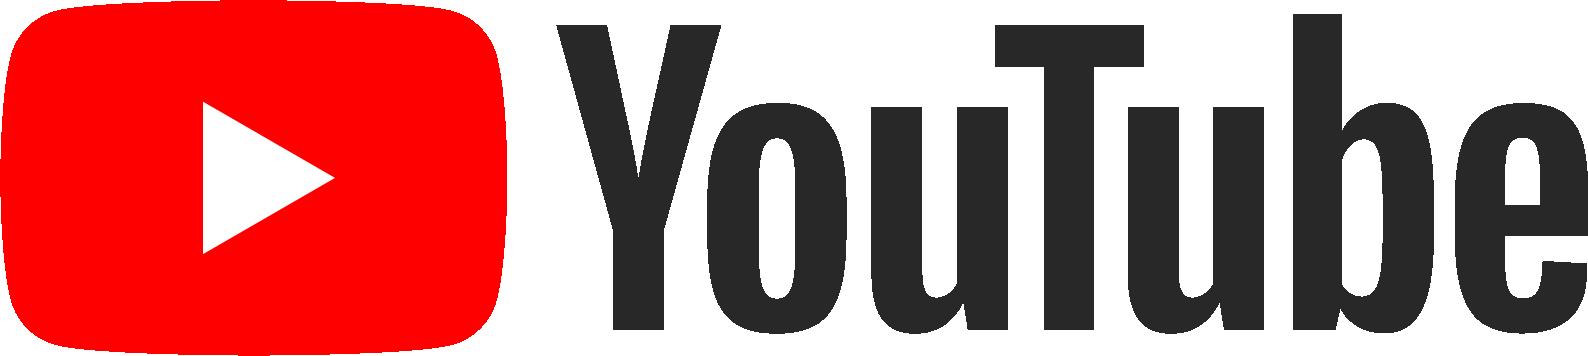 yt_logo_rgb_light-vflc4oMnY.png